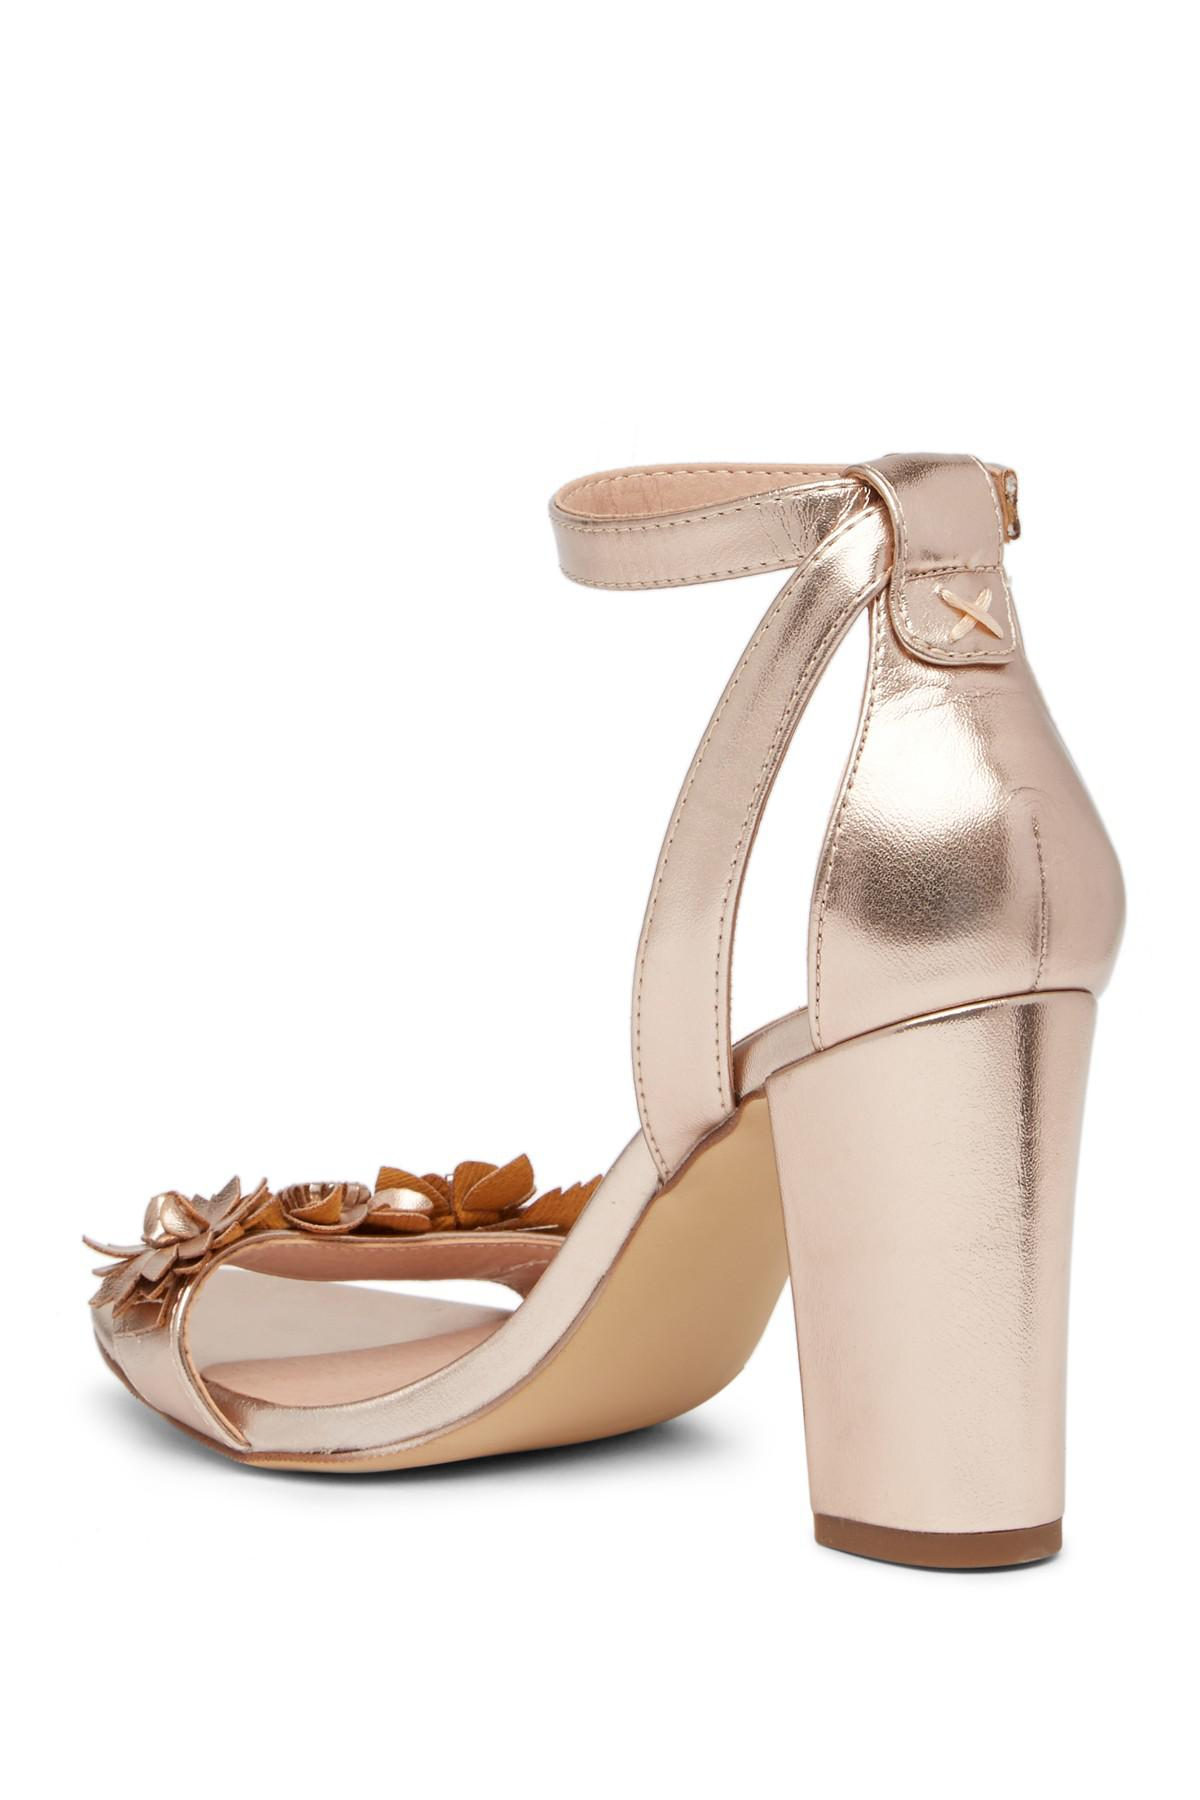 8038f37a68f1 Lyst - Madden Girl Betsyy Embellished Block Heel Sandal